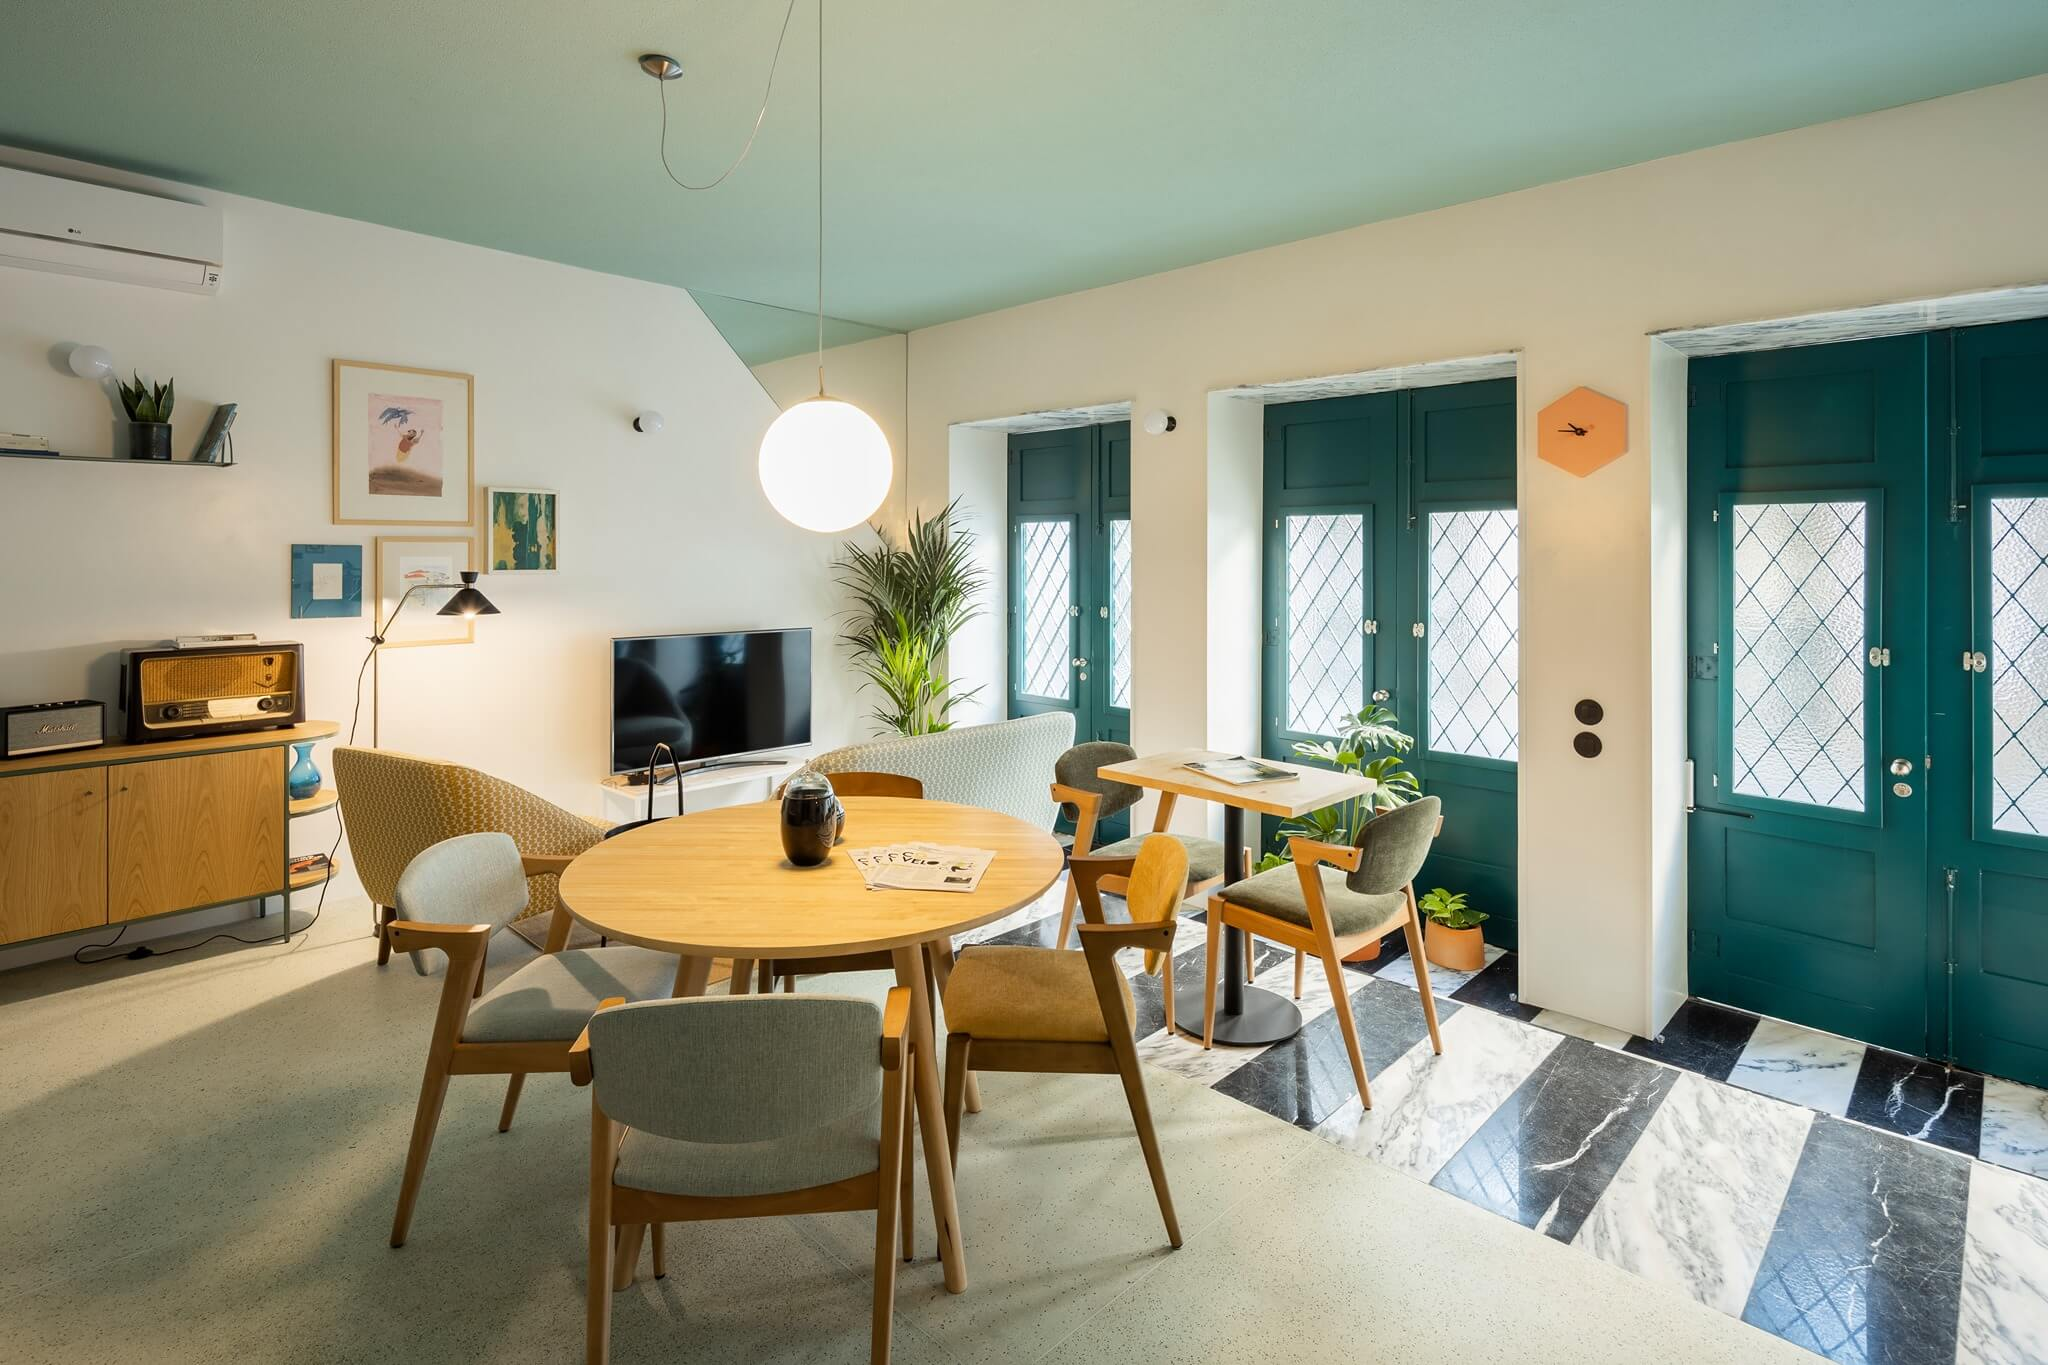 Covelo The Original Rooms & Suites